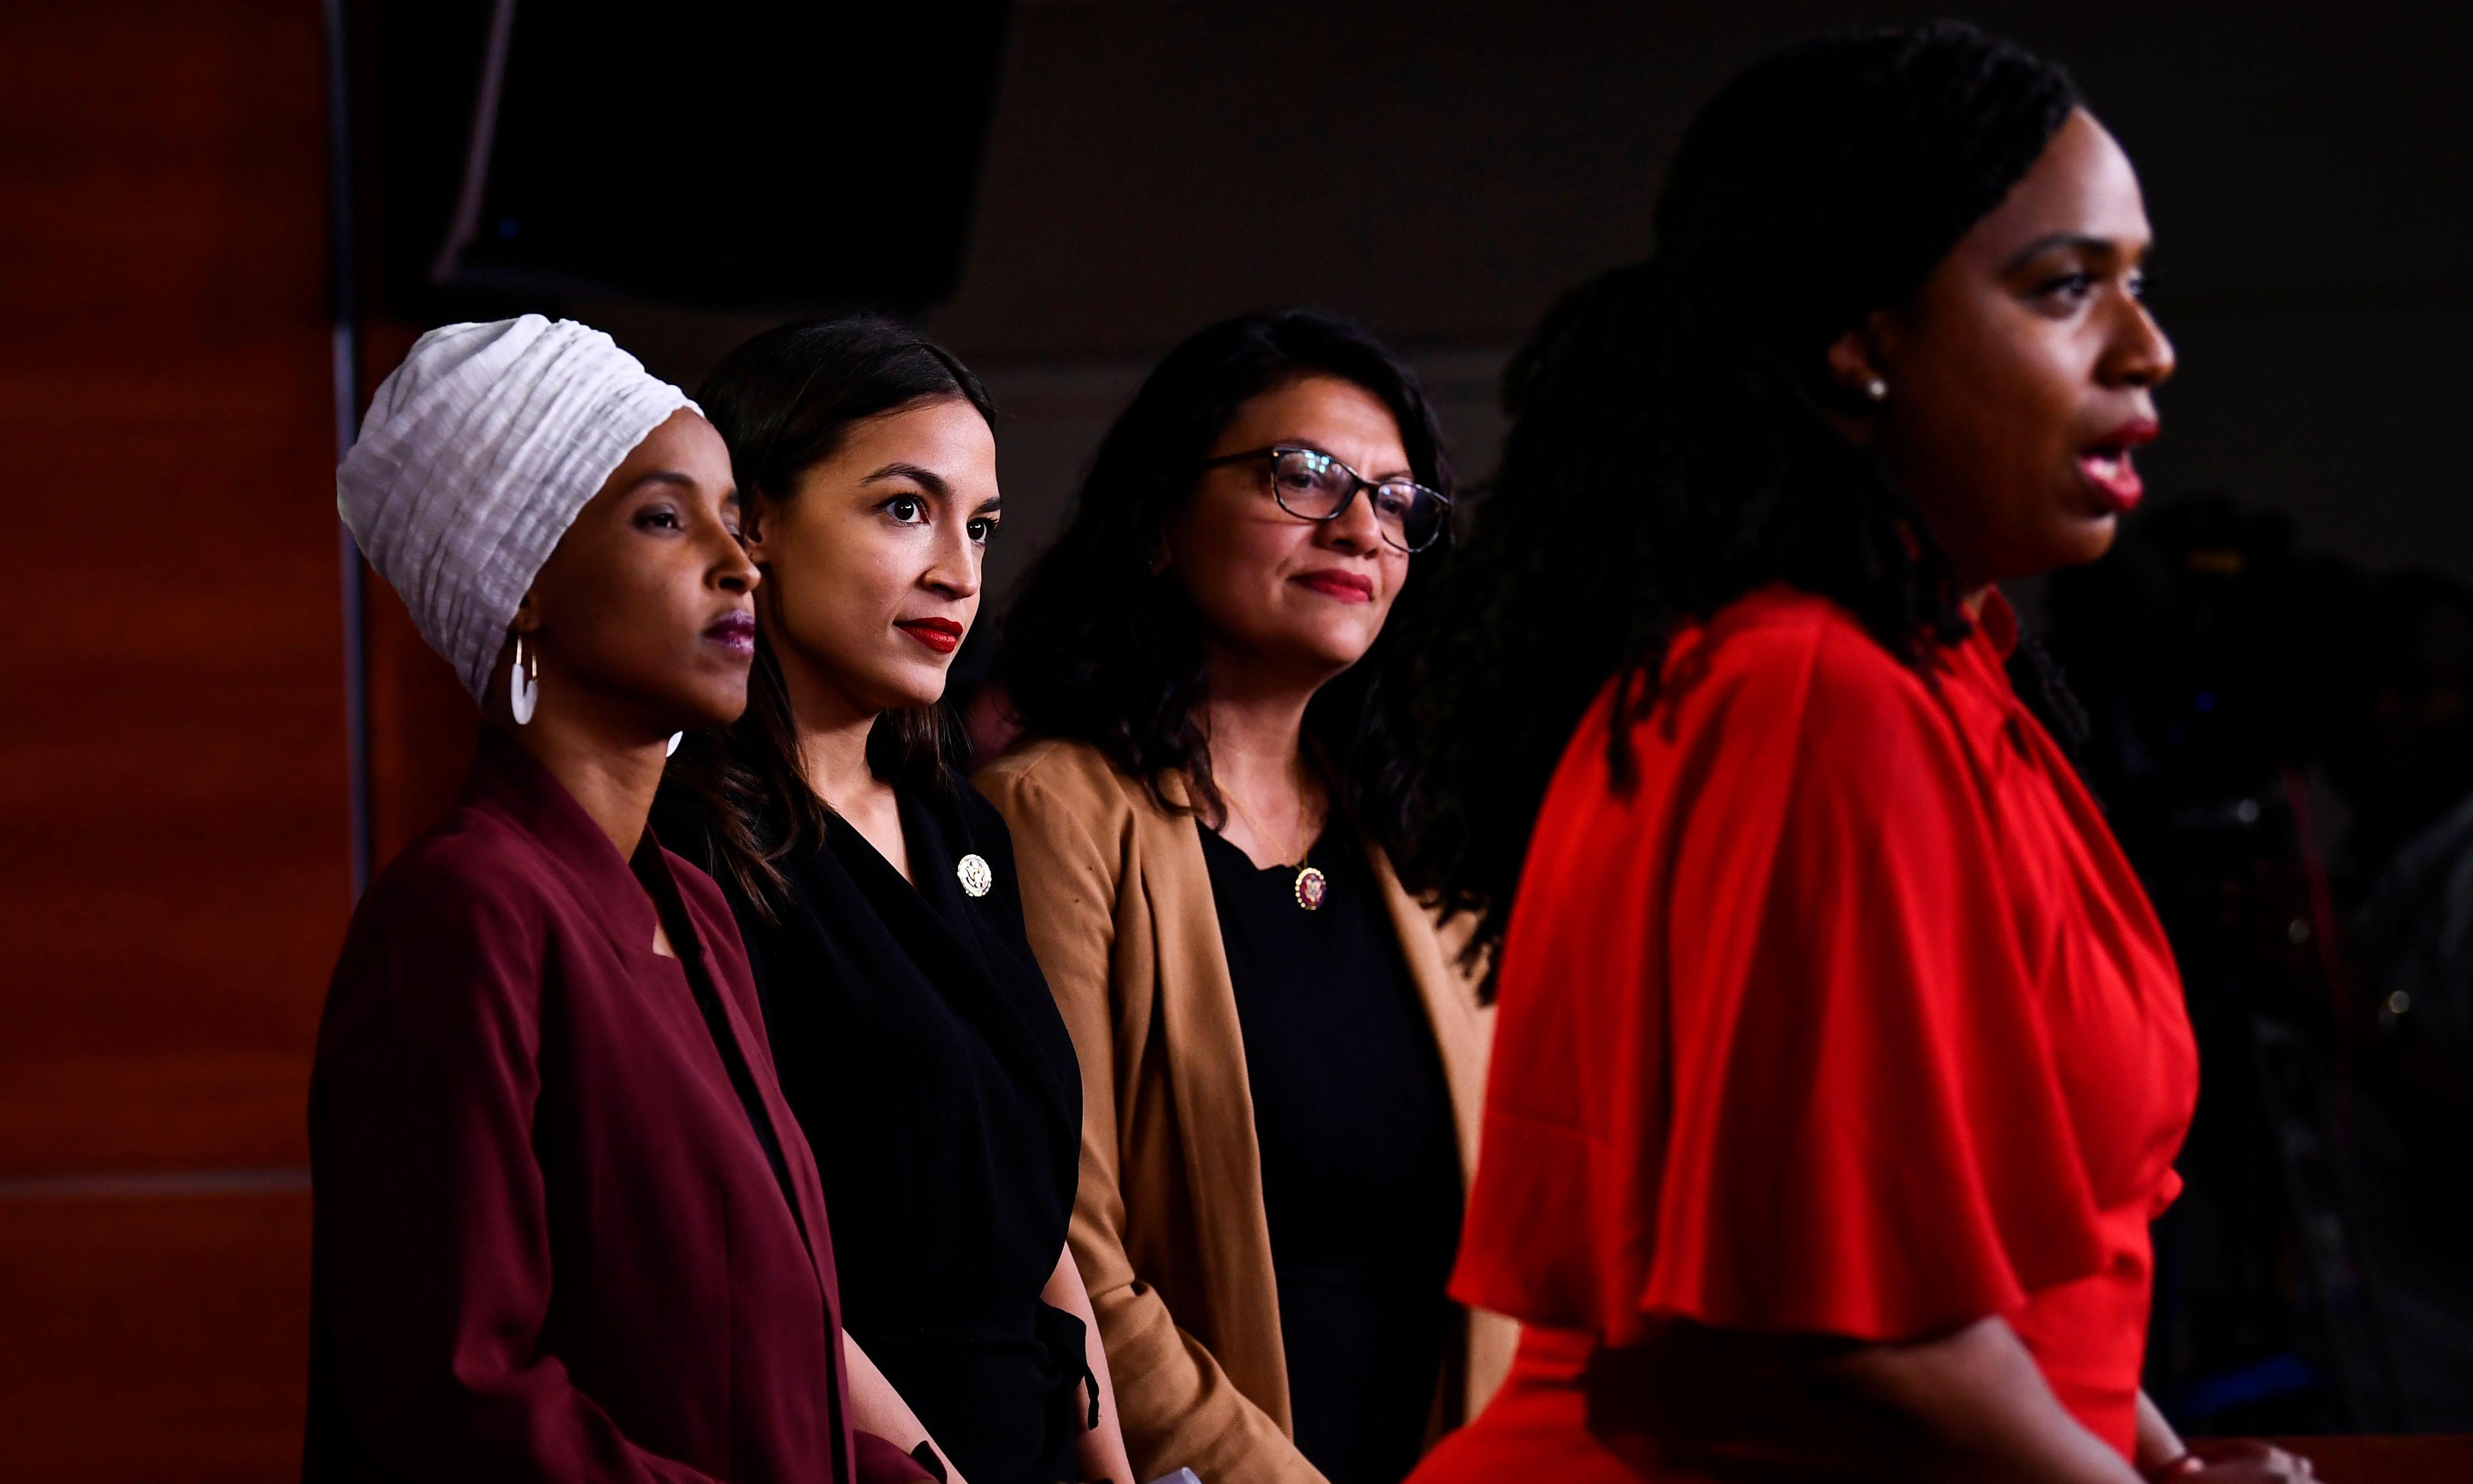 'Do not take the bait': congresswomen denounce racist Trump attack